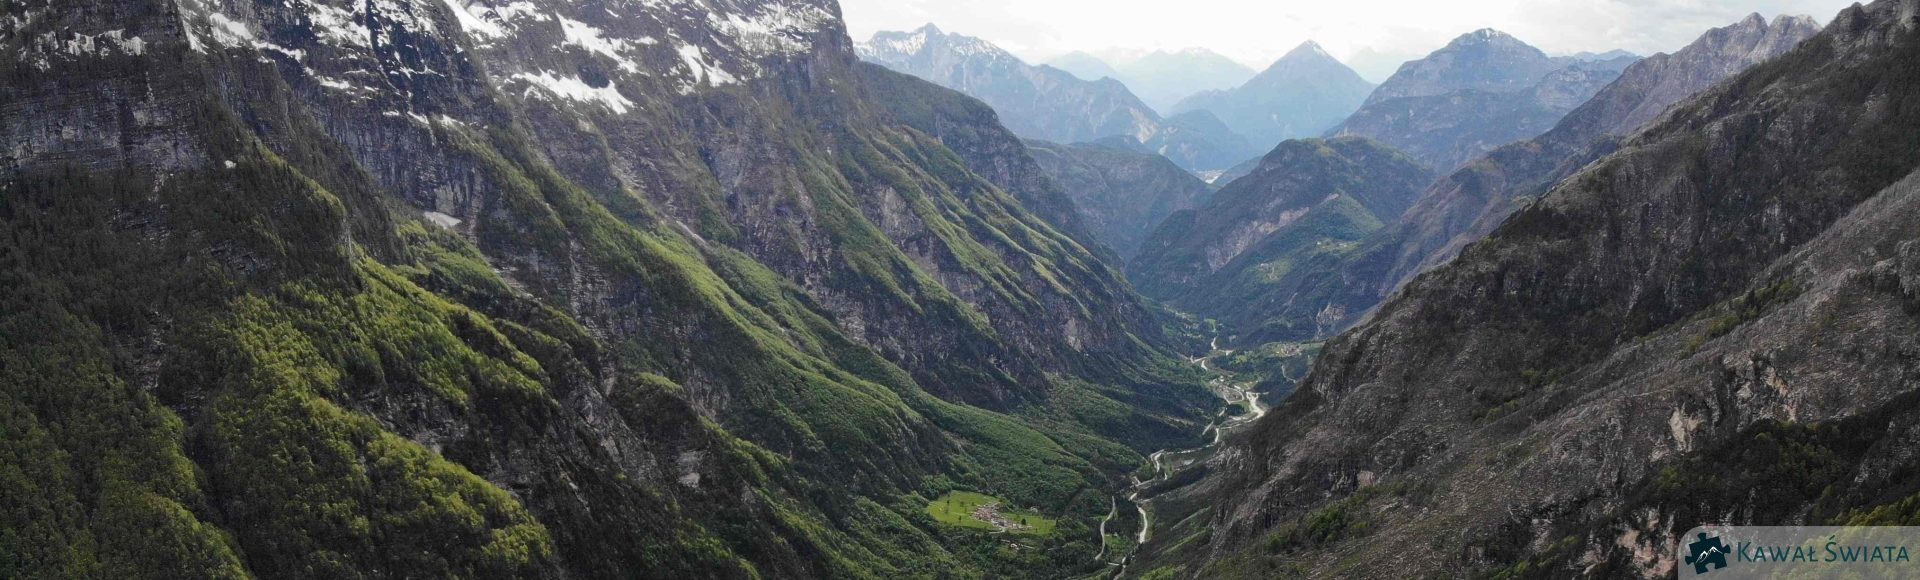 Friulia: szlakiem natury z Chiusaforte do Tarvisio.